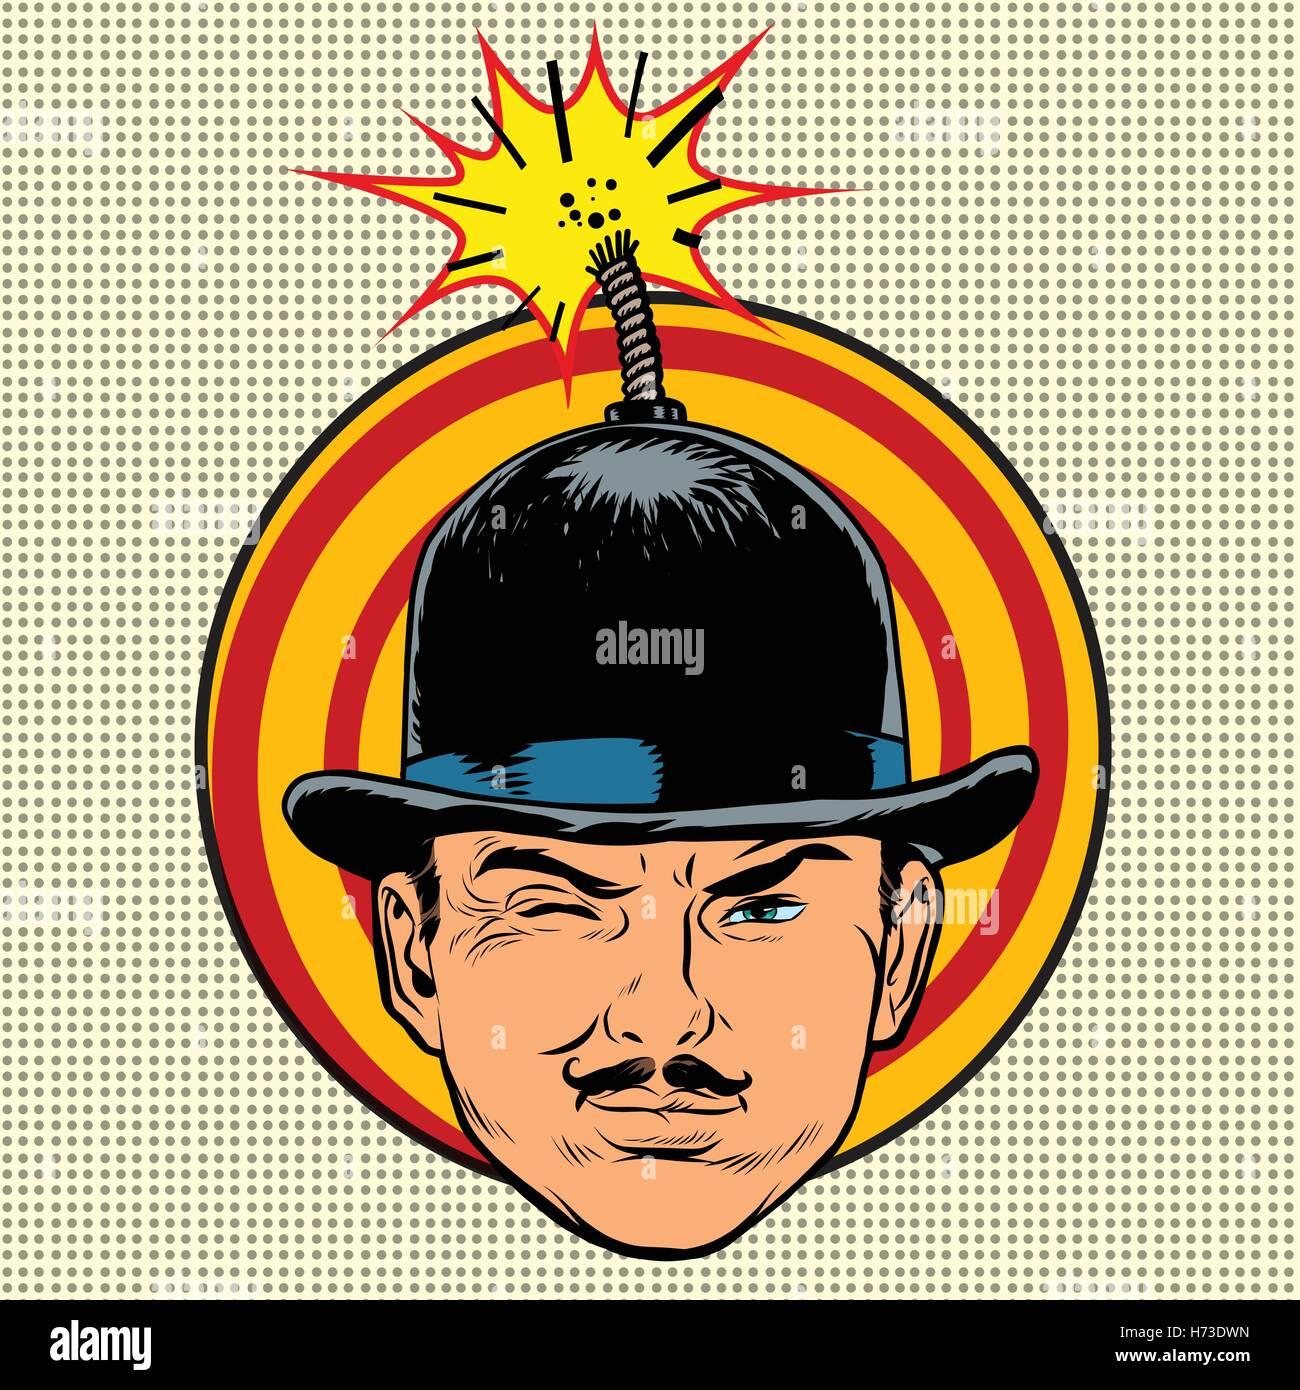 Spy terrorist in the hat bomb wick - Stock Vector